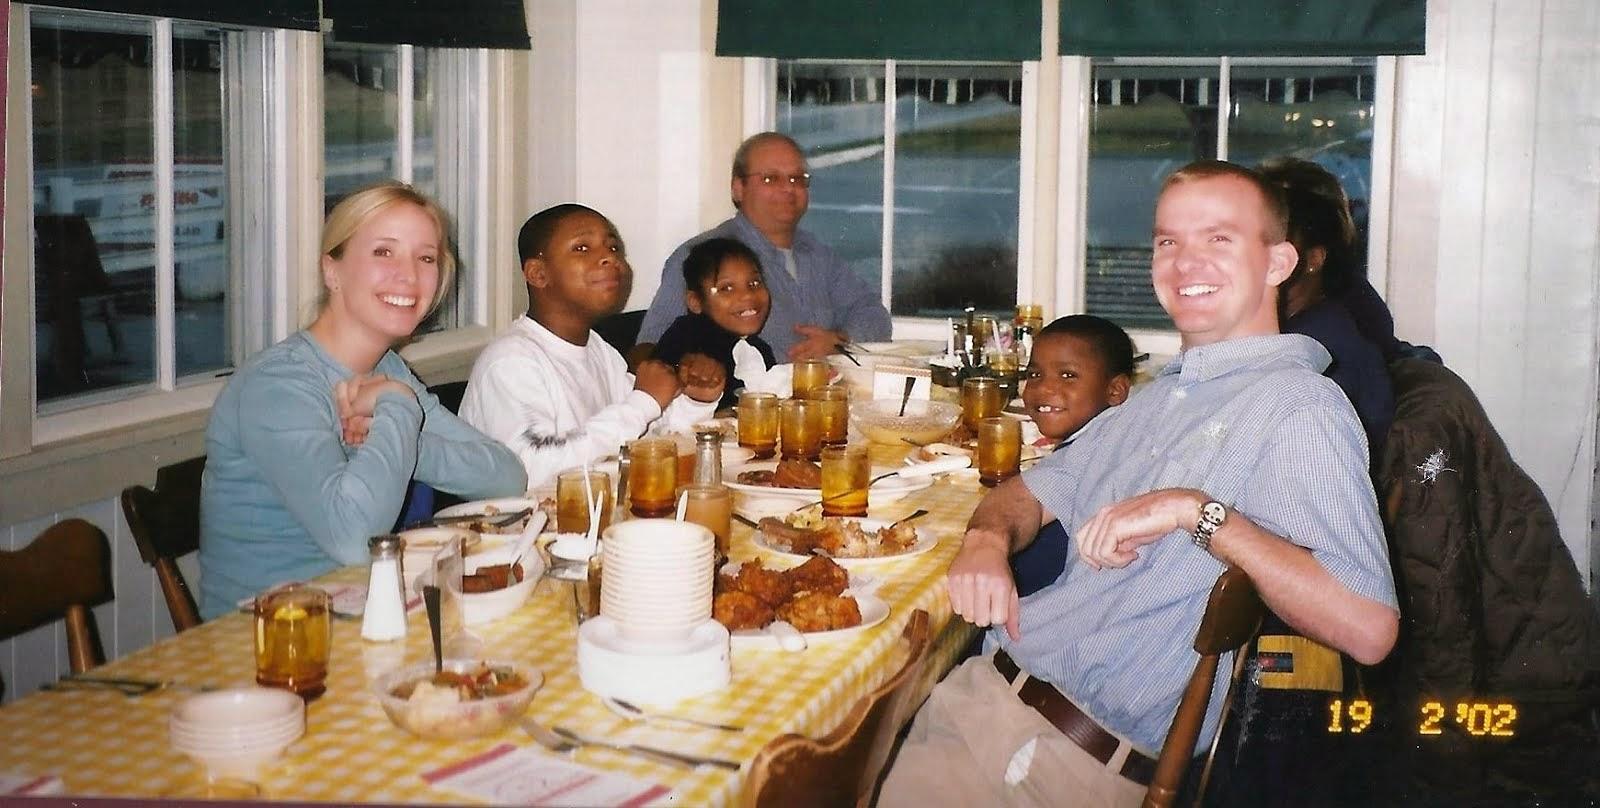 Lancaster, Pennsylvania 2002